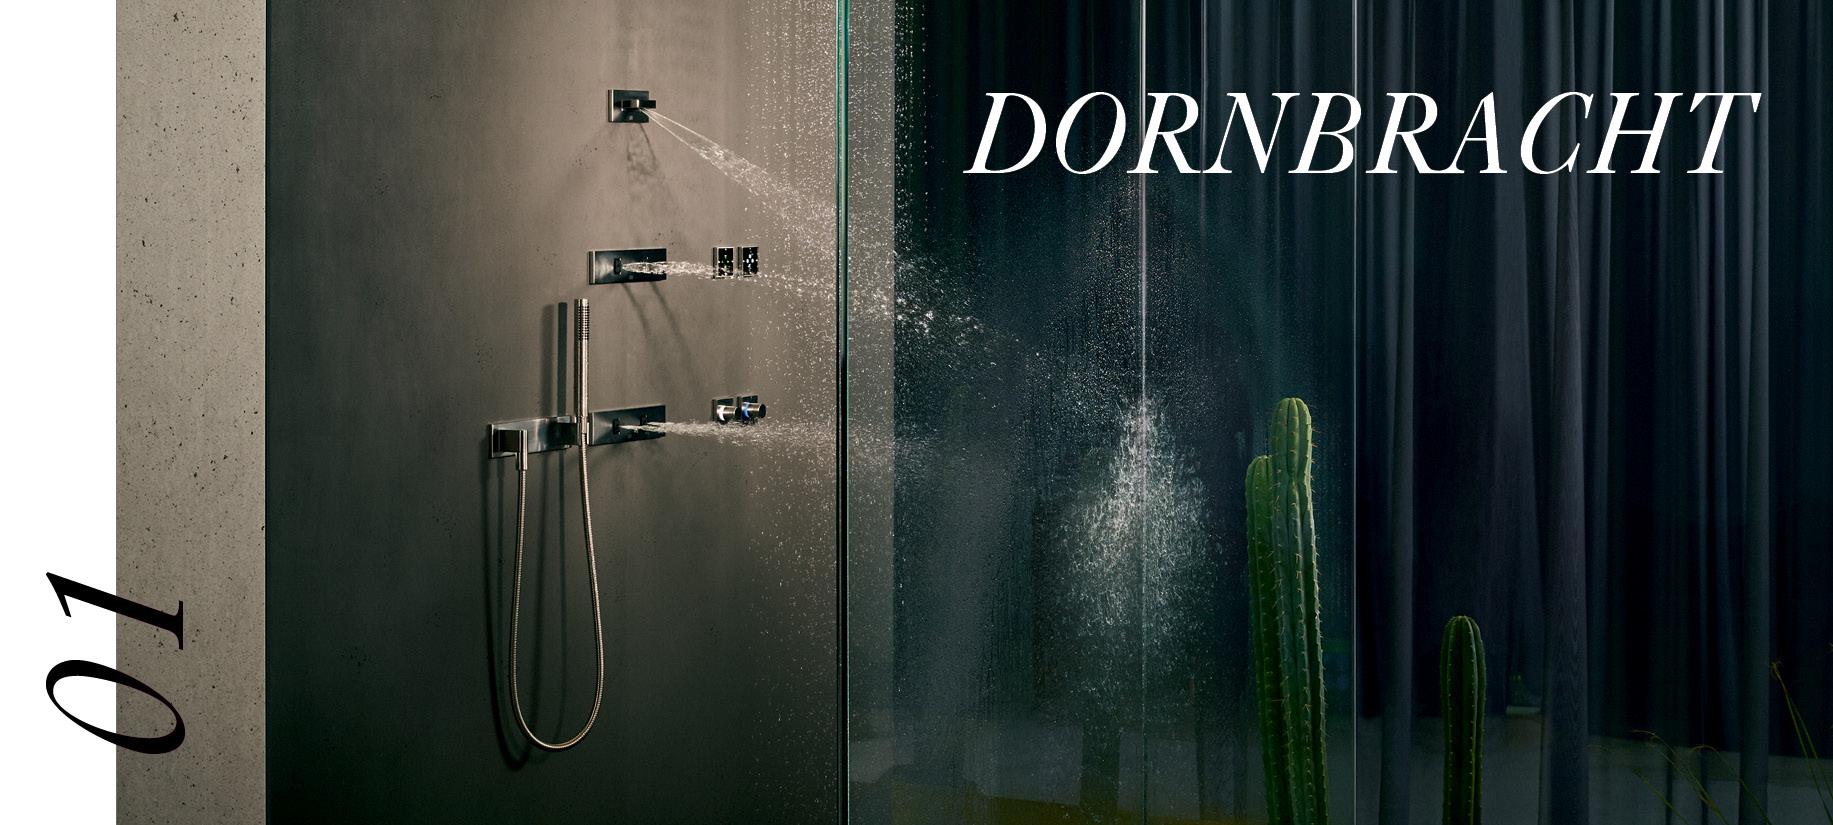 Turn bathroom into spa with Dornbracht LifeSpa's rain shower